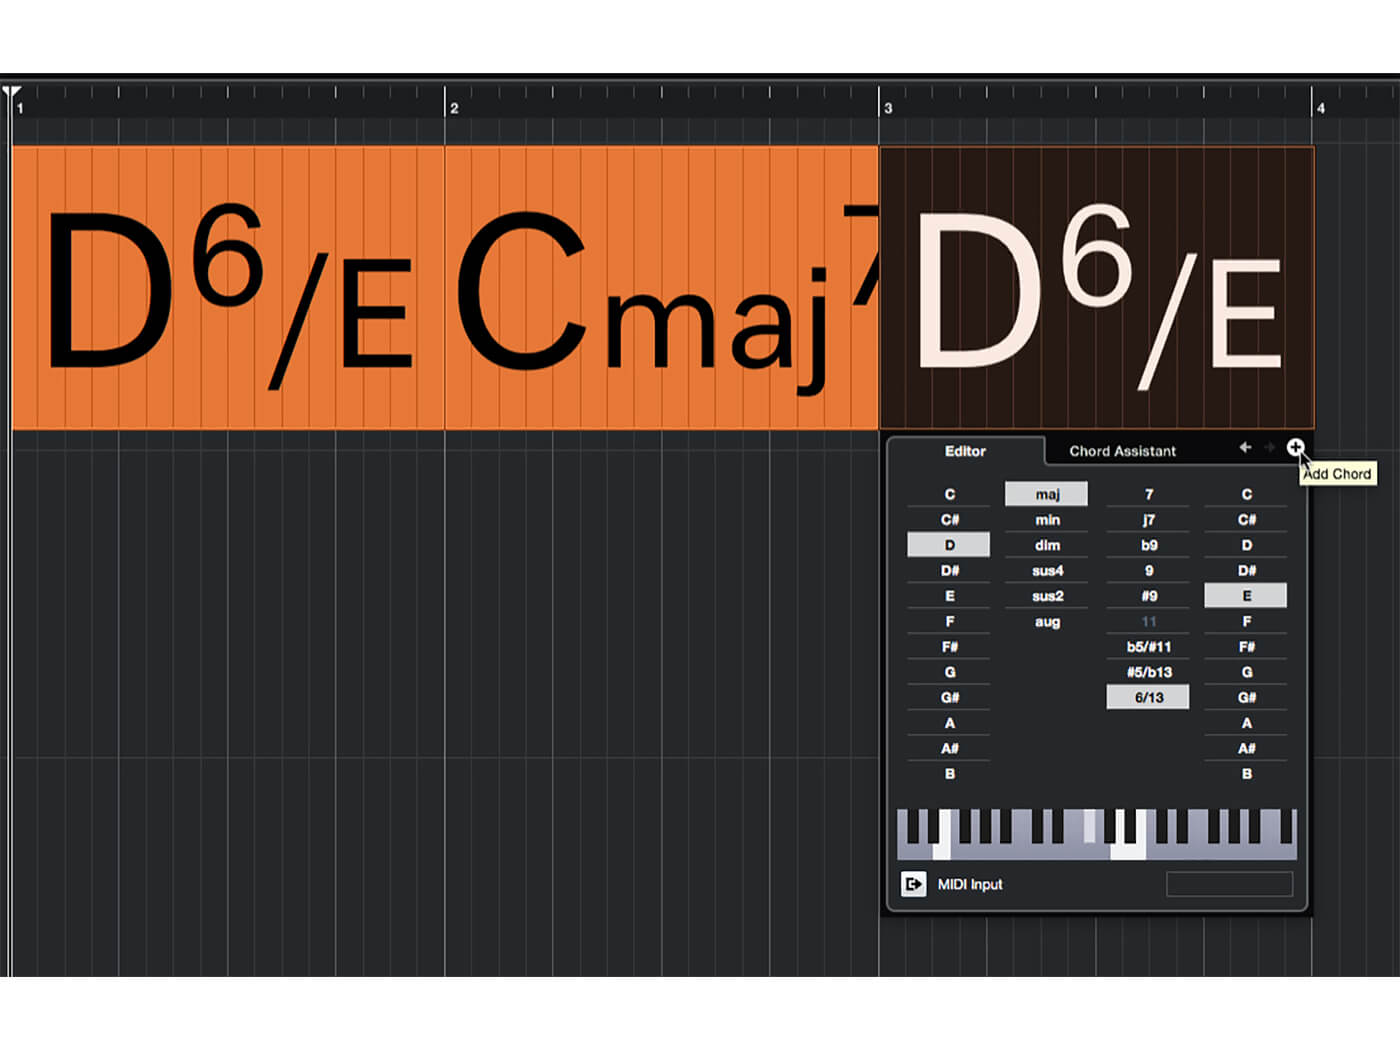 MT 205 Cubase Score Editor Step 4